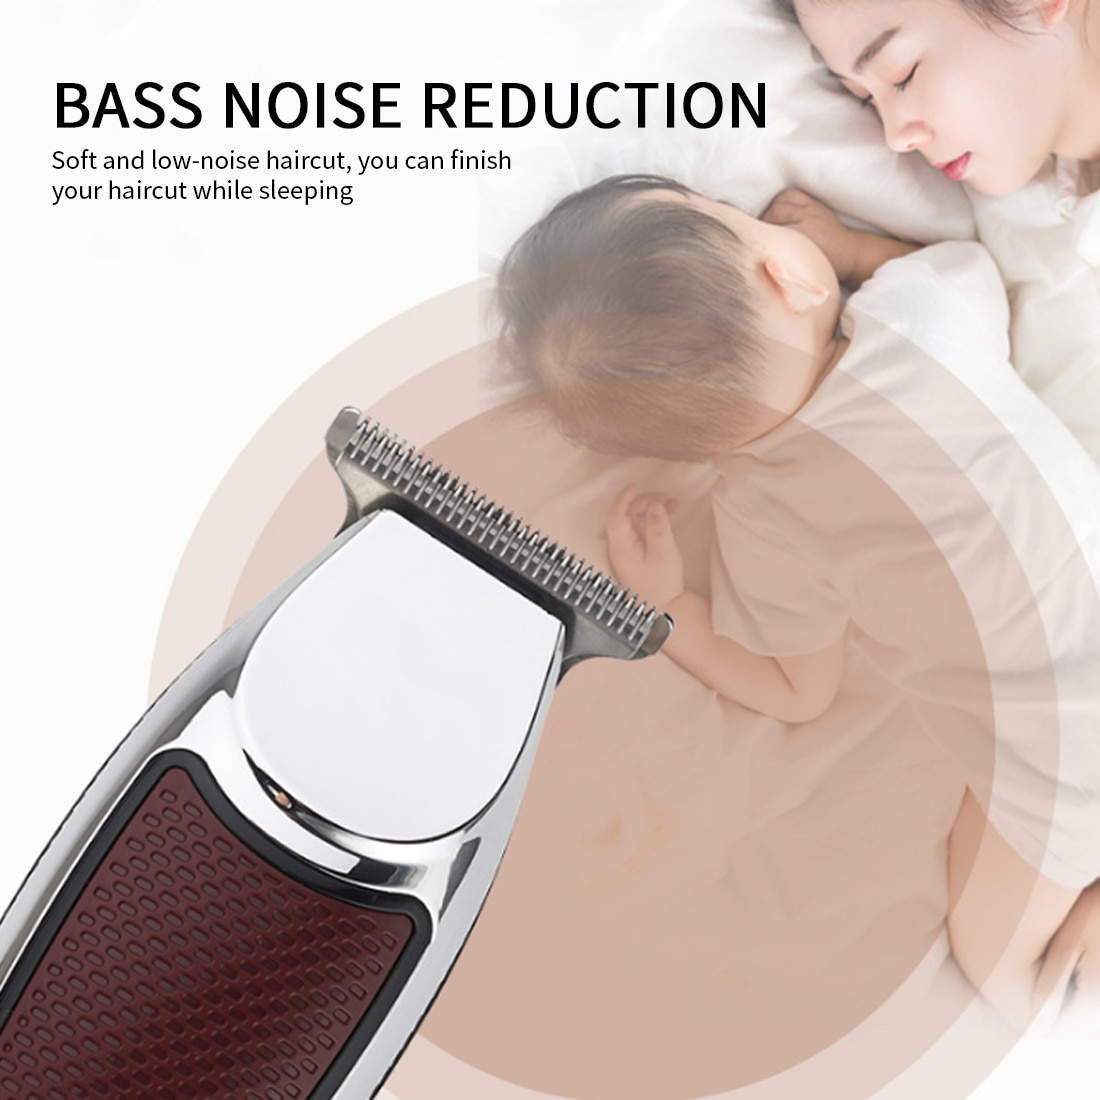 Men's Hair Clipper Professional Hair Trimmer Titanium Ceramic Blade Ear Shaver Adult Razor Grooming Low Noise Clipper Tool enlarge